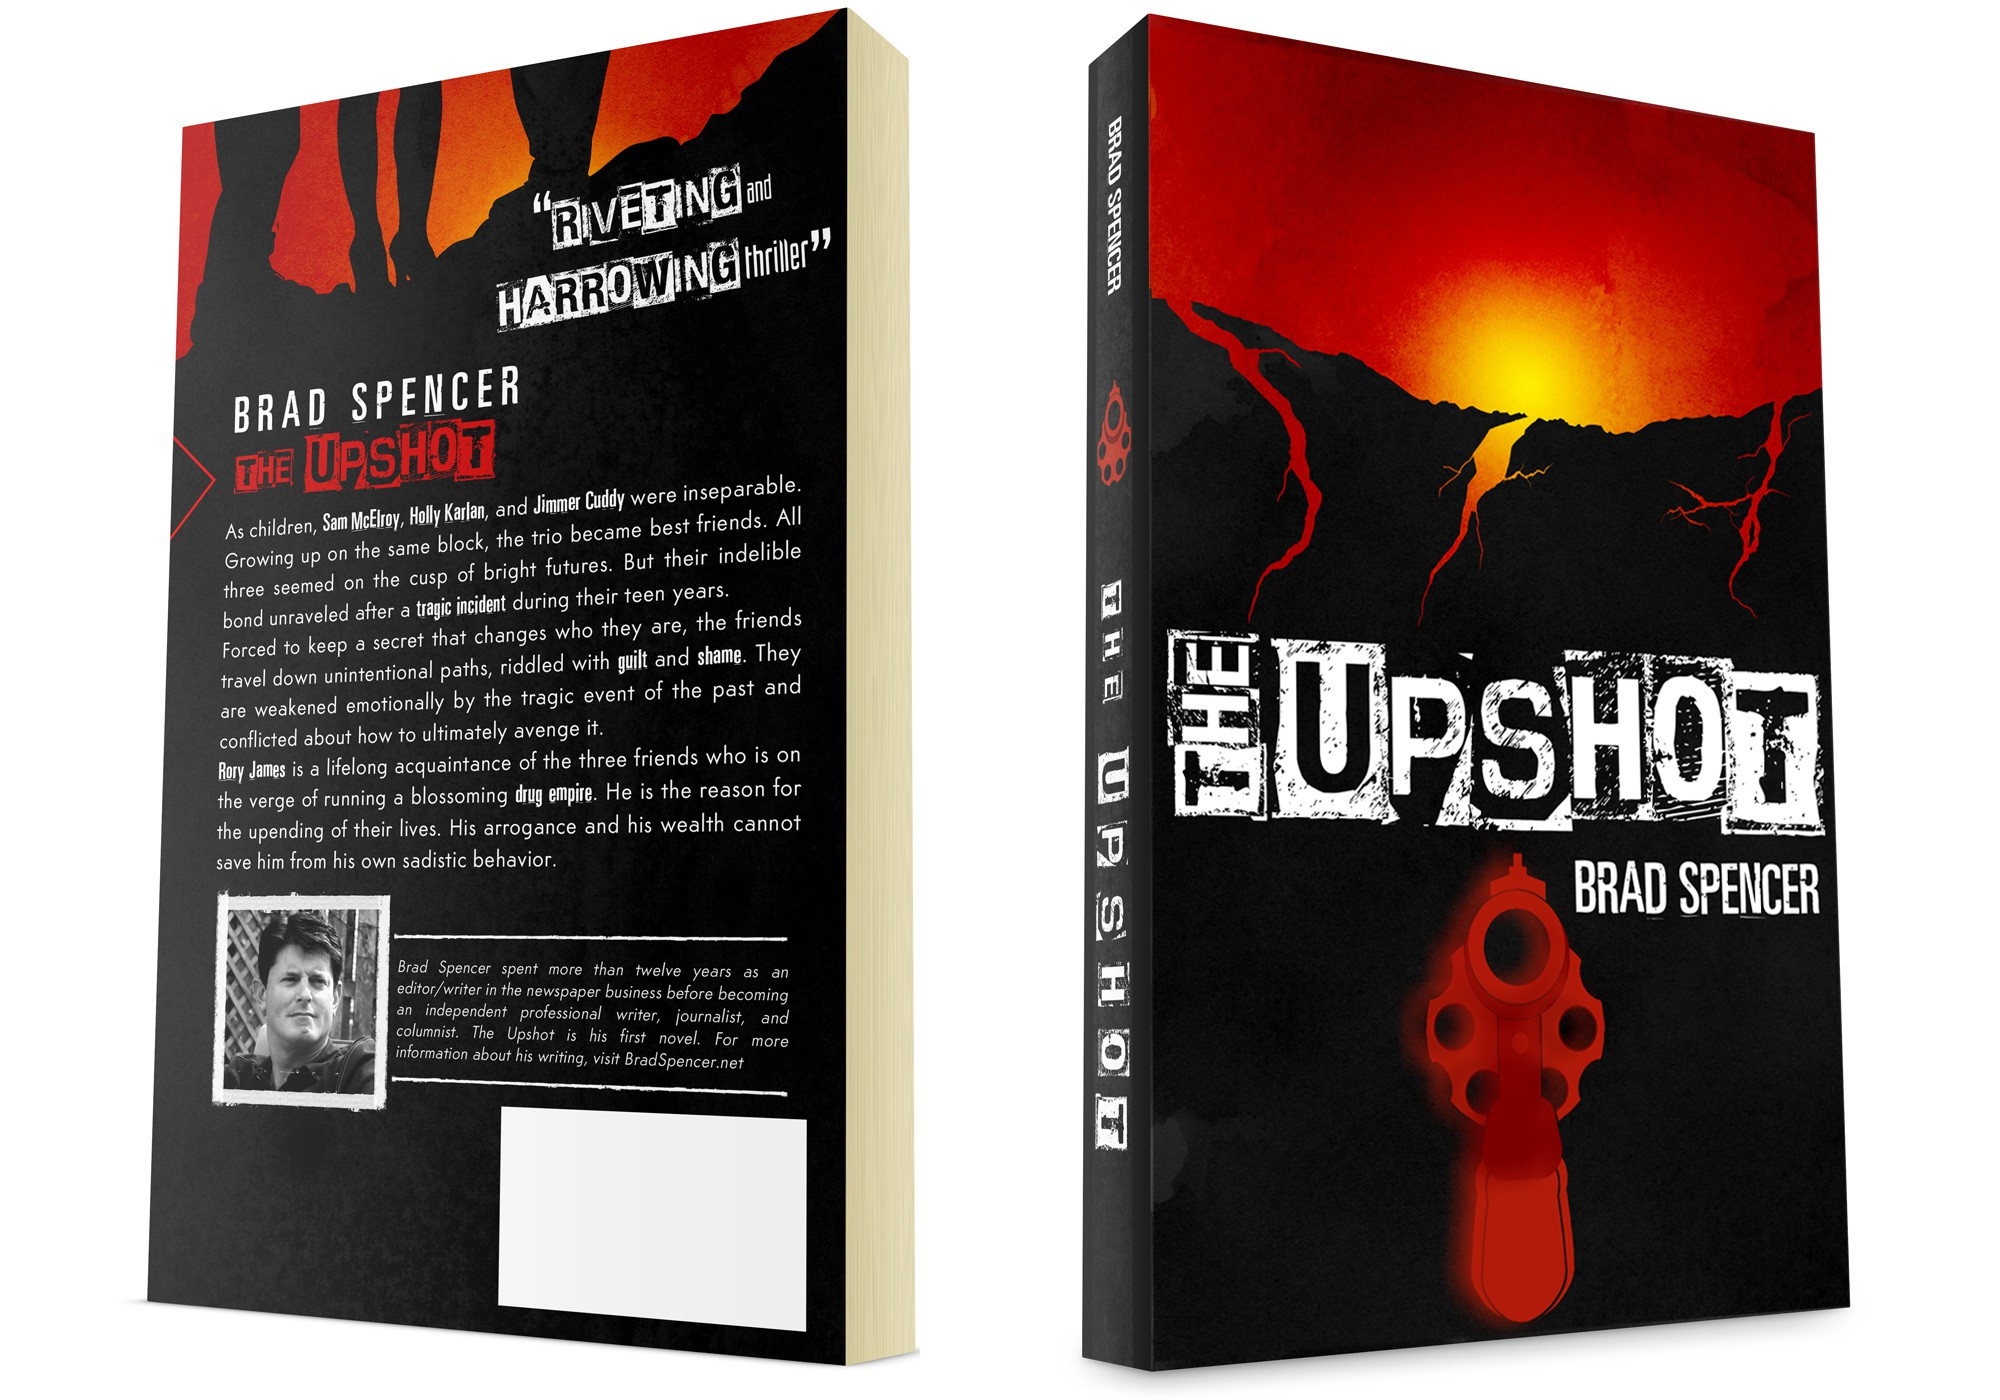 Book cover for a riveting suspense/thriller/crime novel